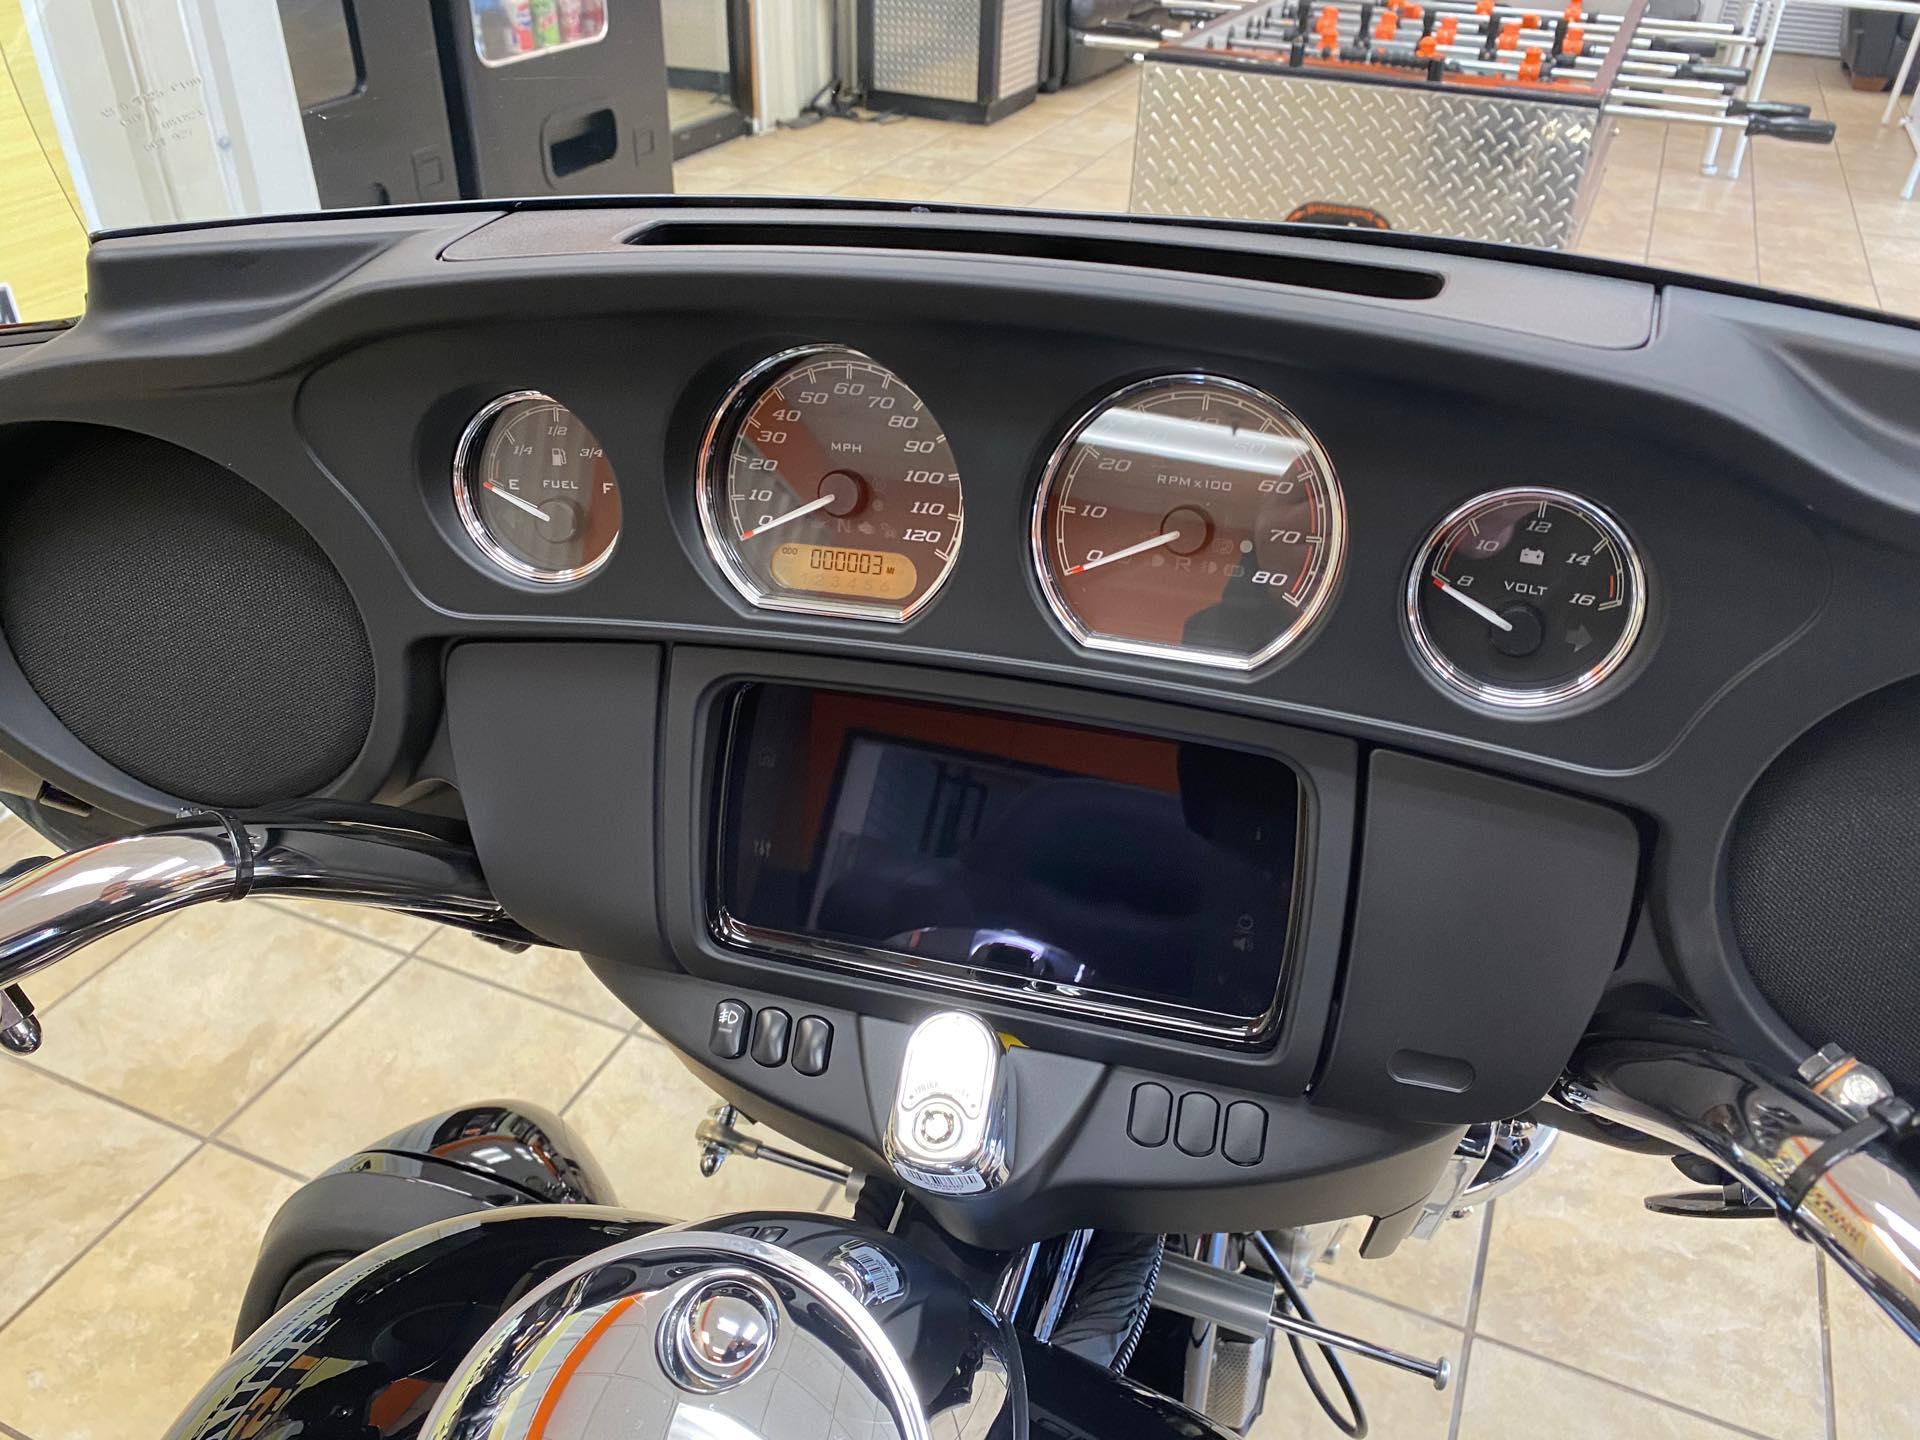 2021 Harley-Davidson Trike Tri Glide Ultra at Gold Star Harley-Davidson